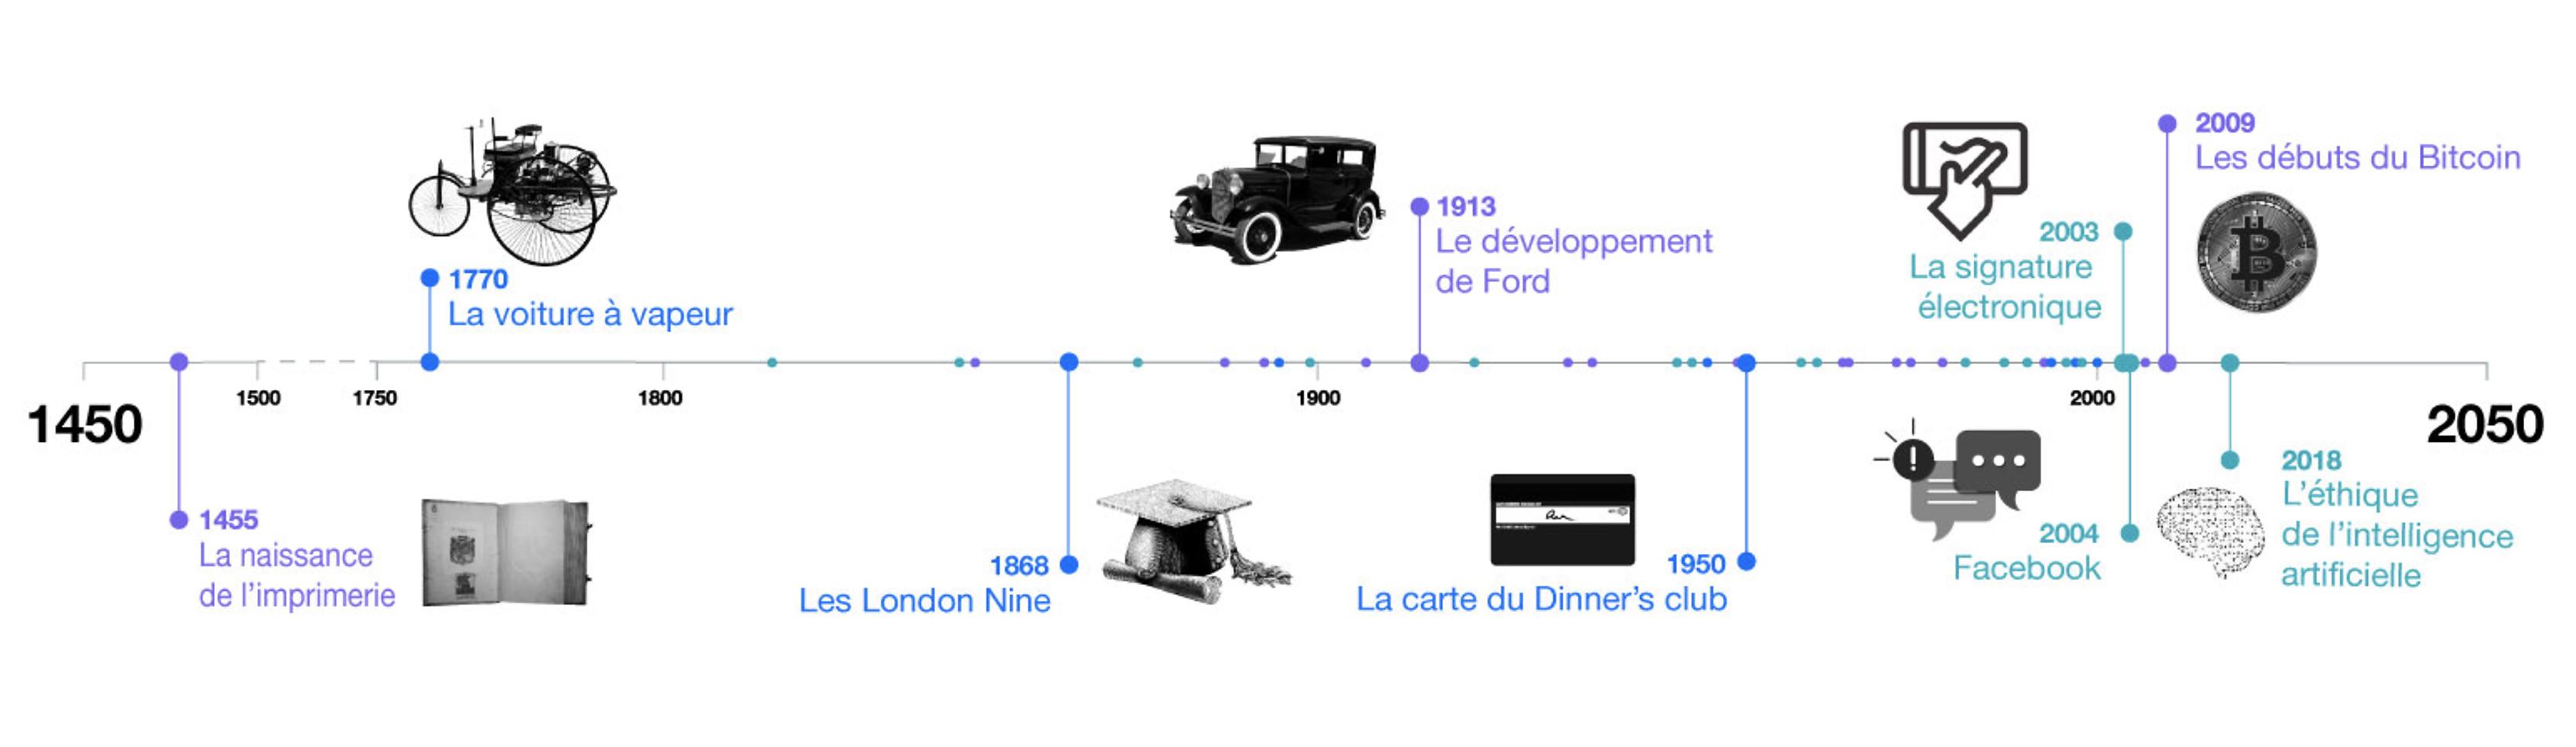 L'Histoire de l'Innovation en 50 accords